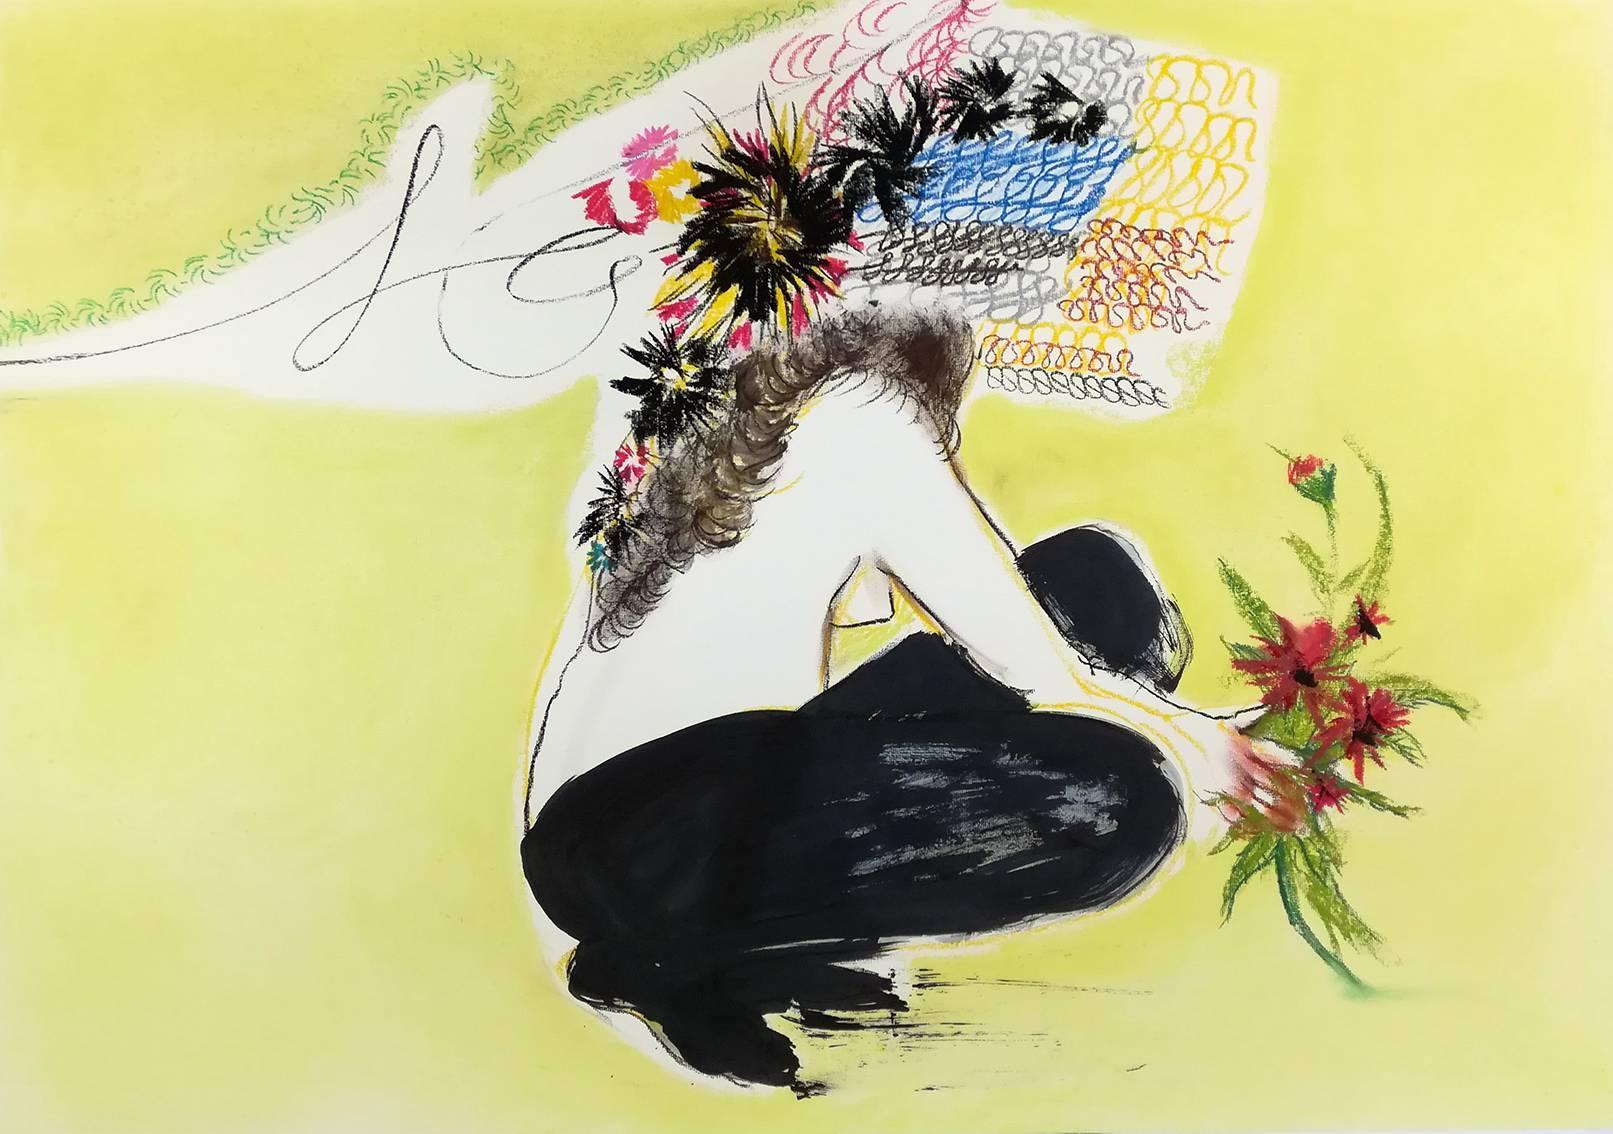 Eduardo Infante, Aztec Leggings, 2017